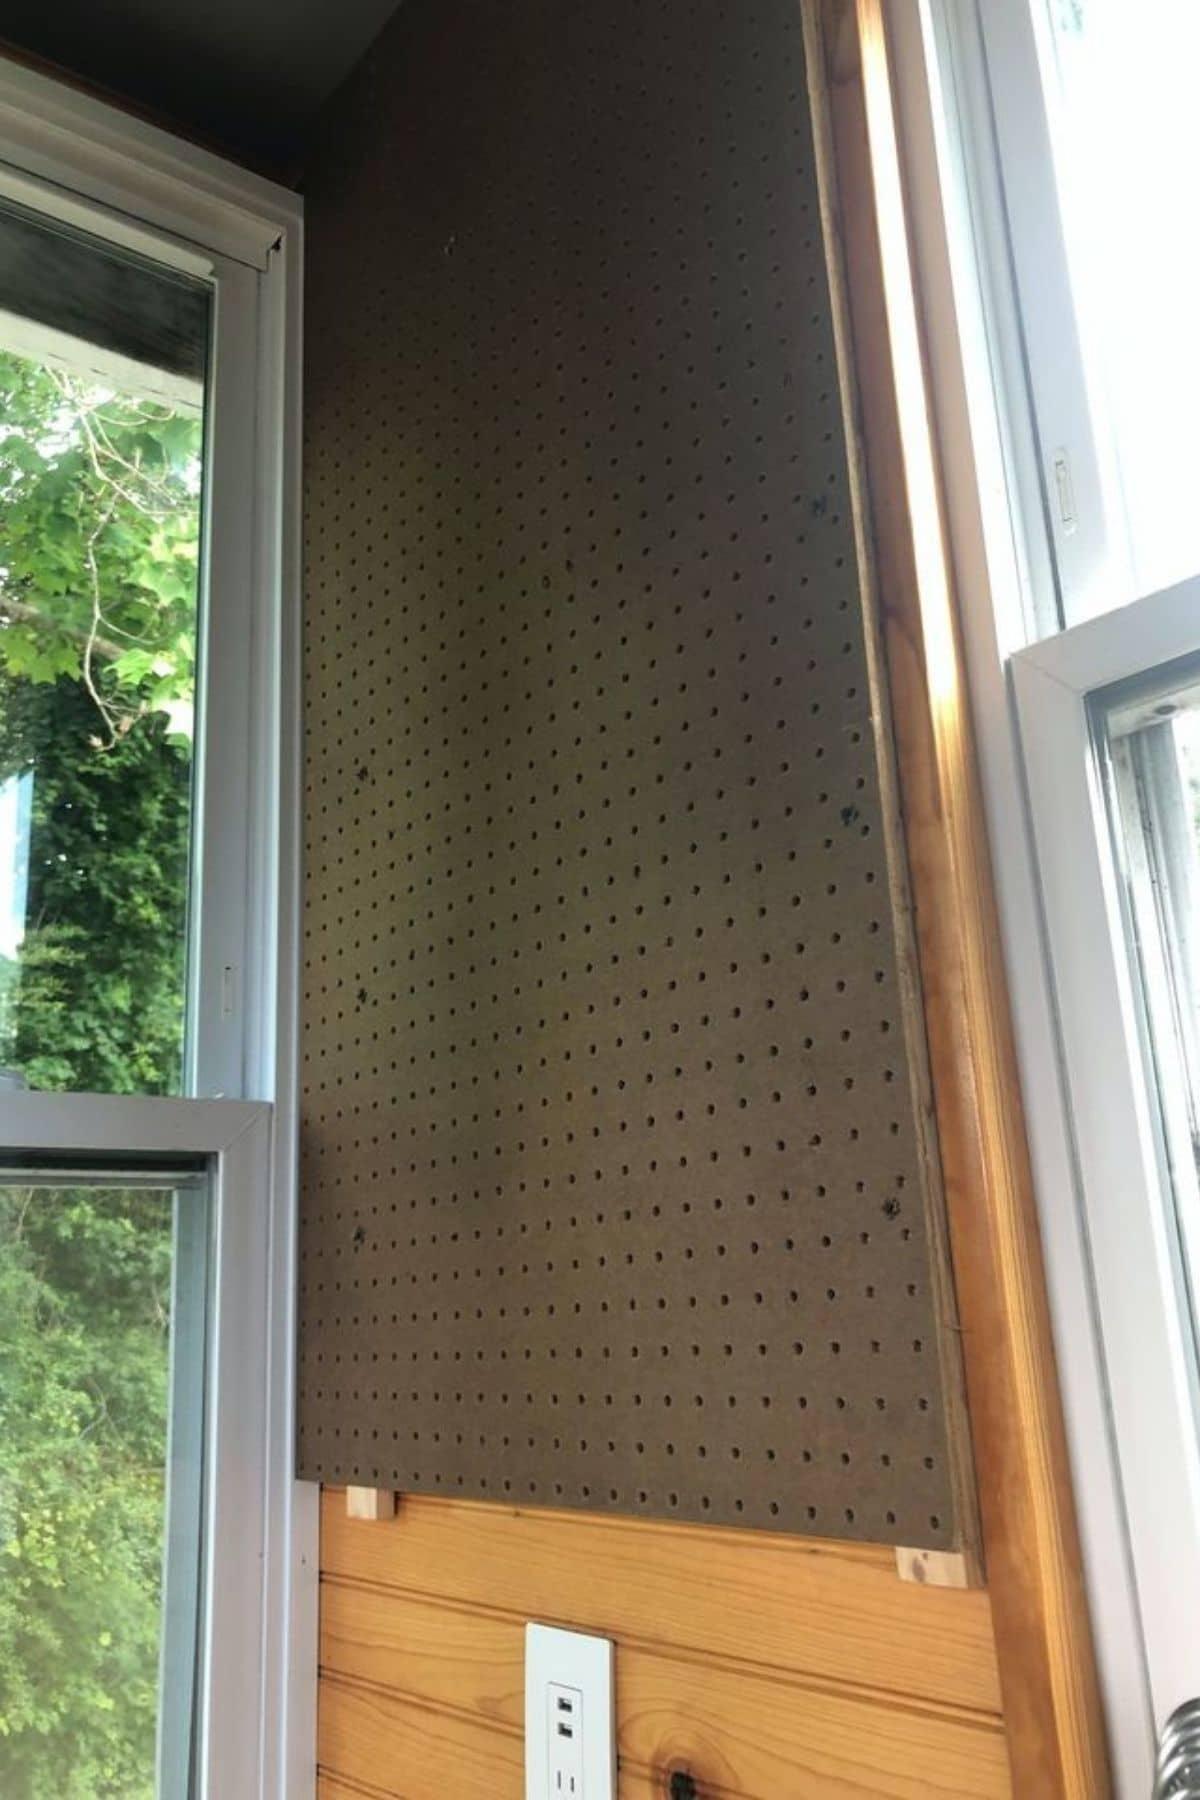 Brown pegboard hanging on wall between windows